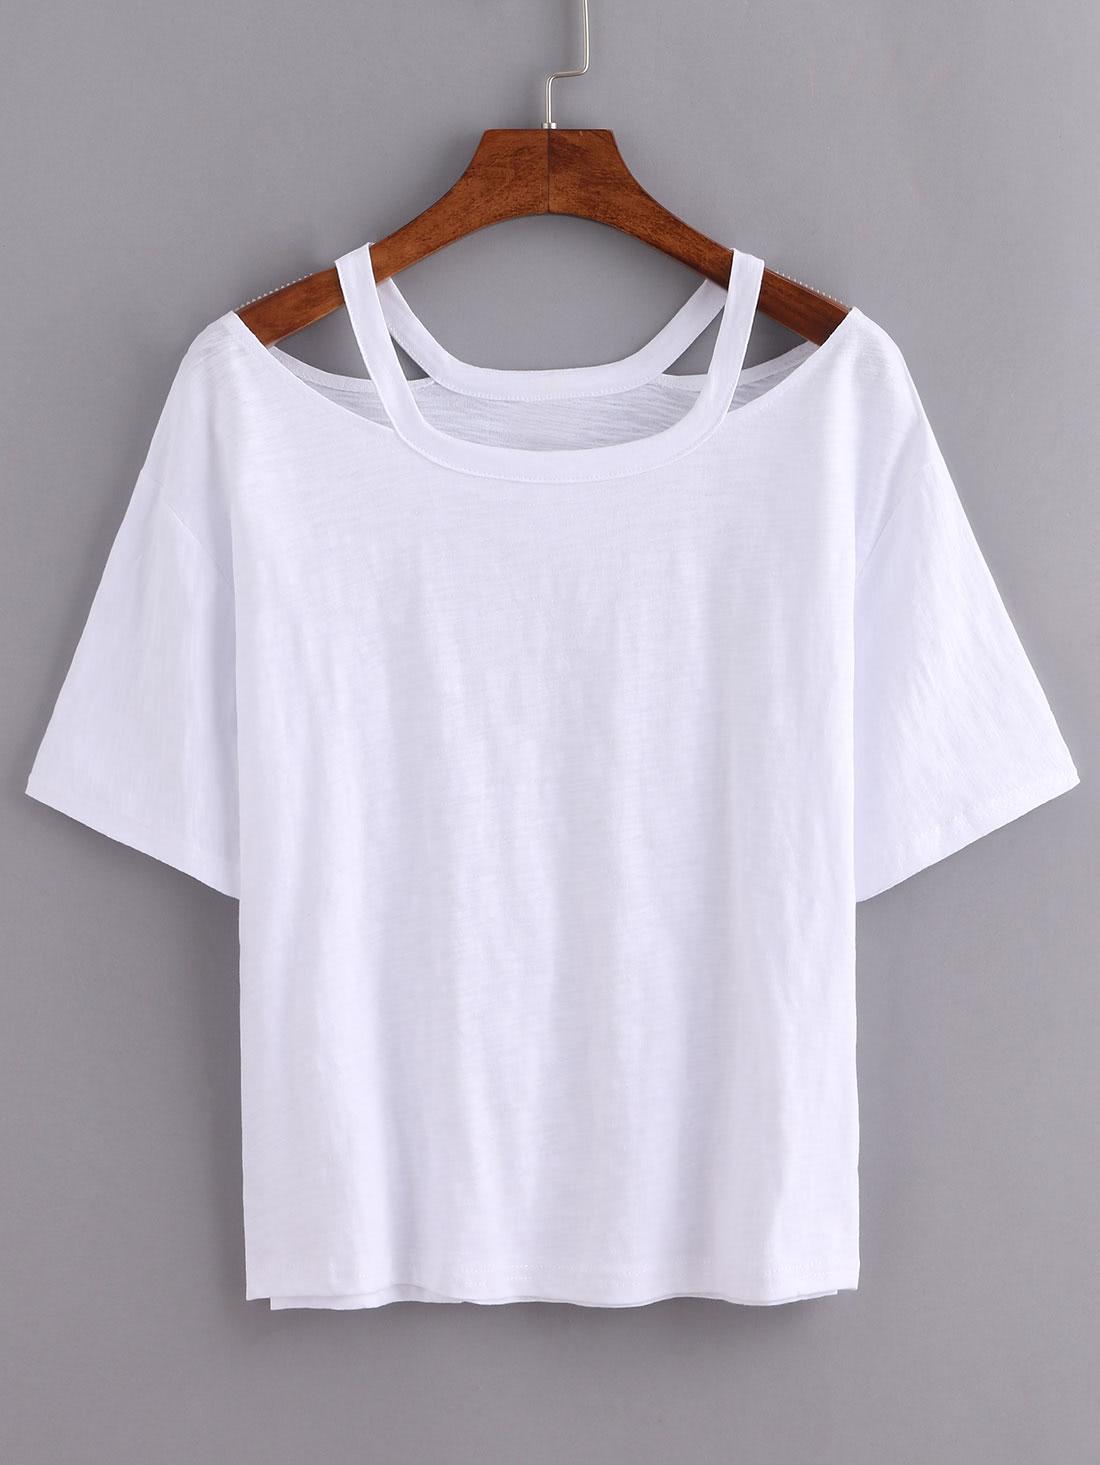 Cutout Loose Fit White T Shirt